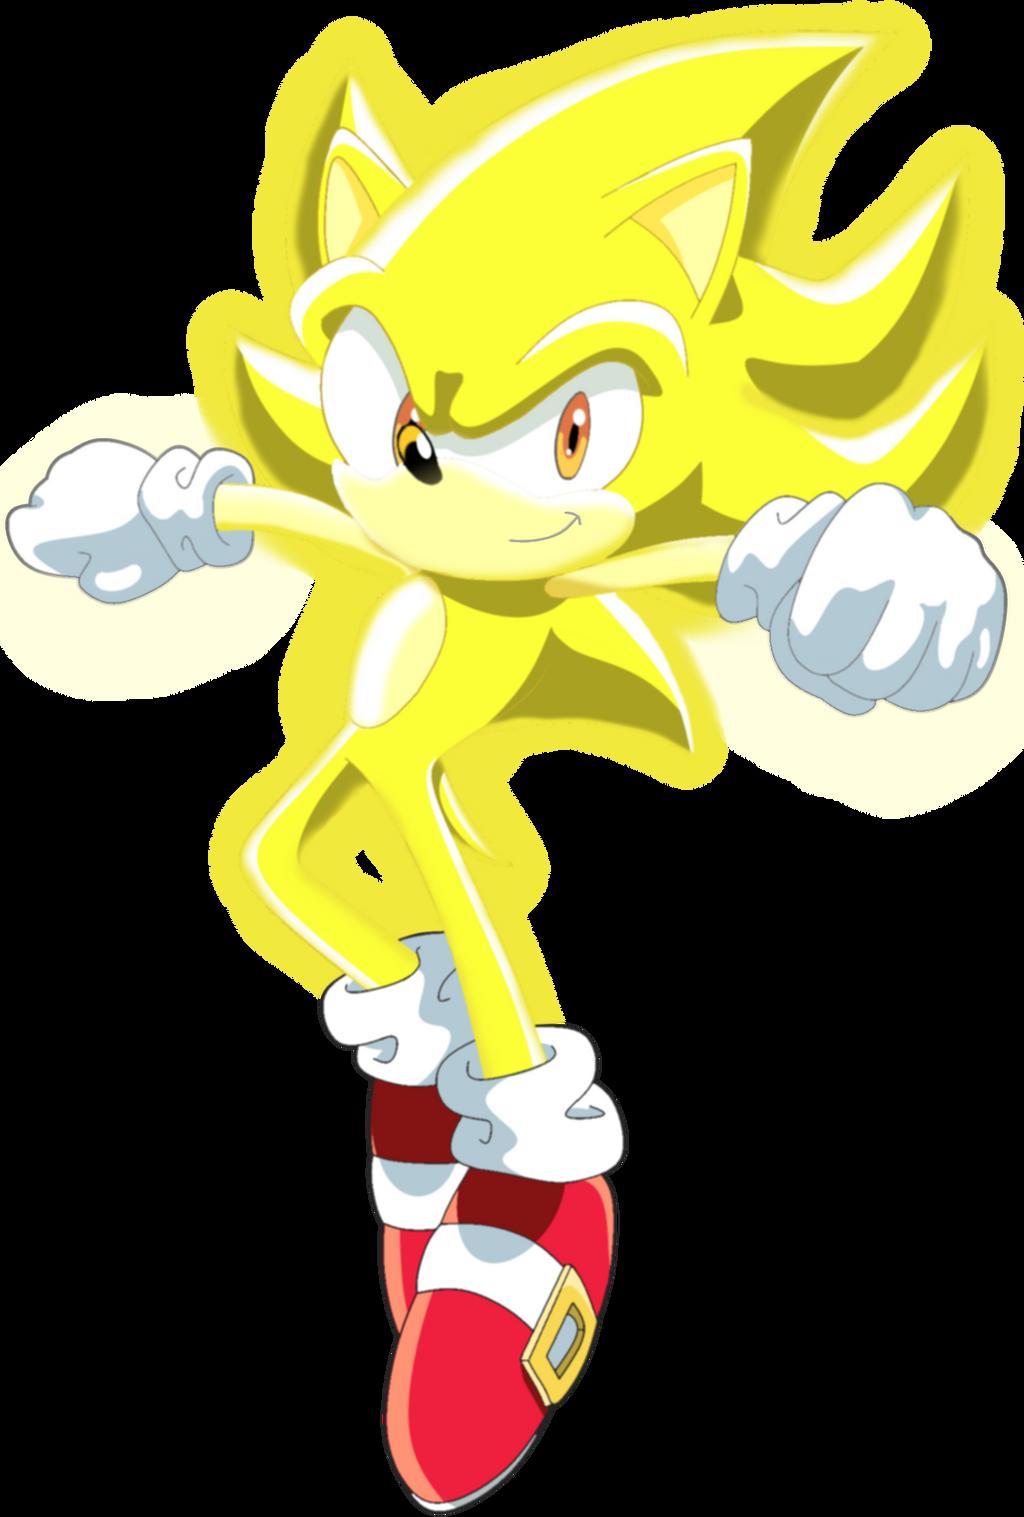 199 sonic the hedgehog - photo #39